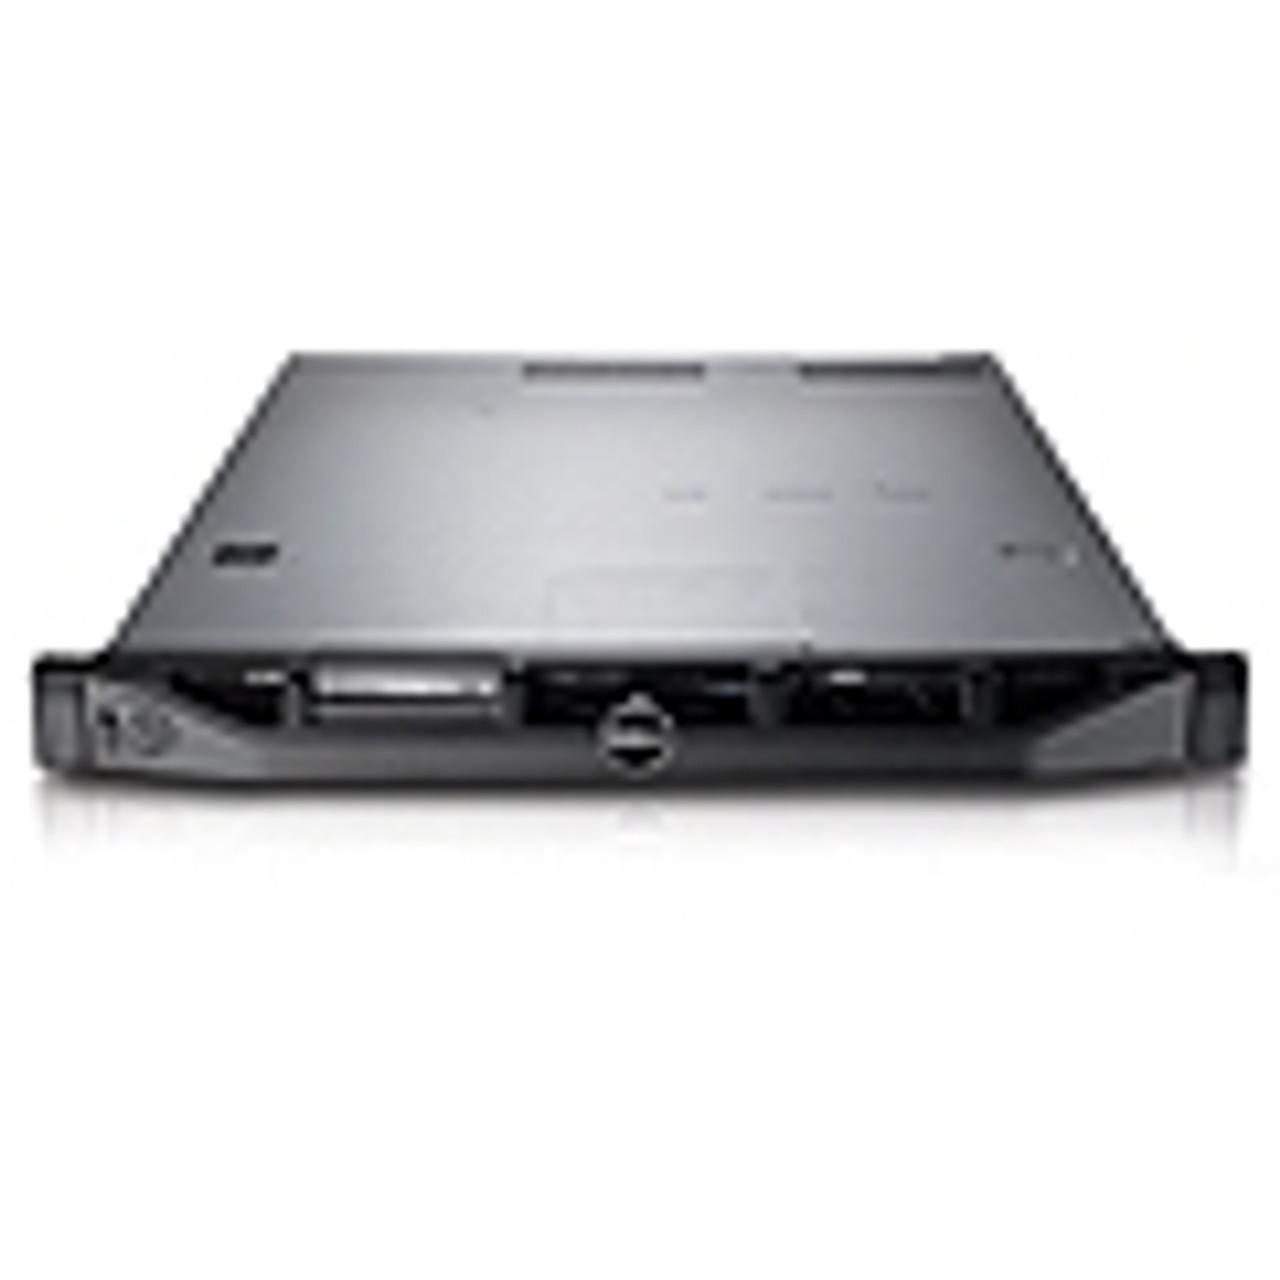 Dell PowerEdge R310 Servers